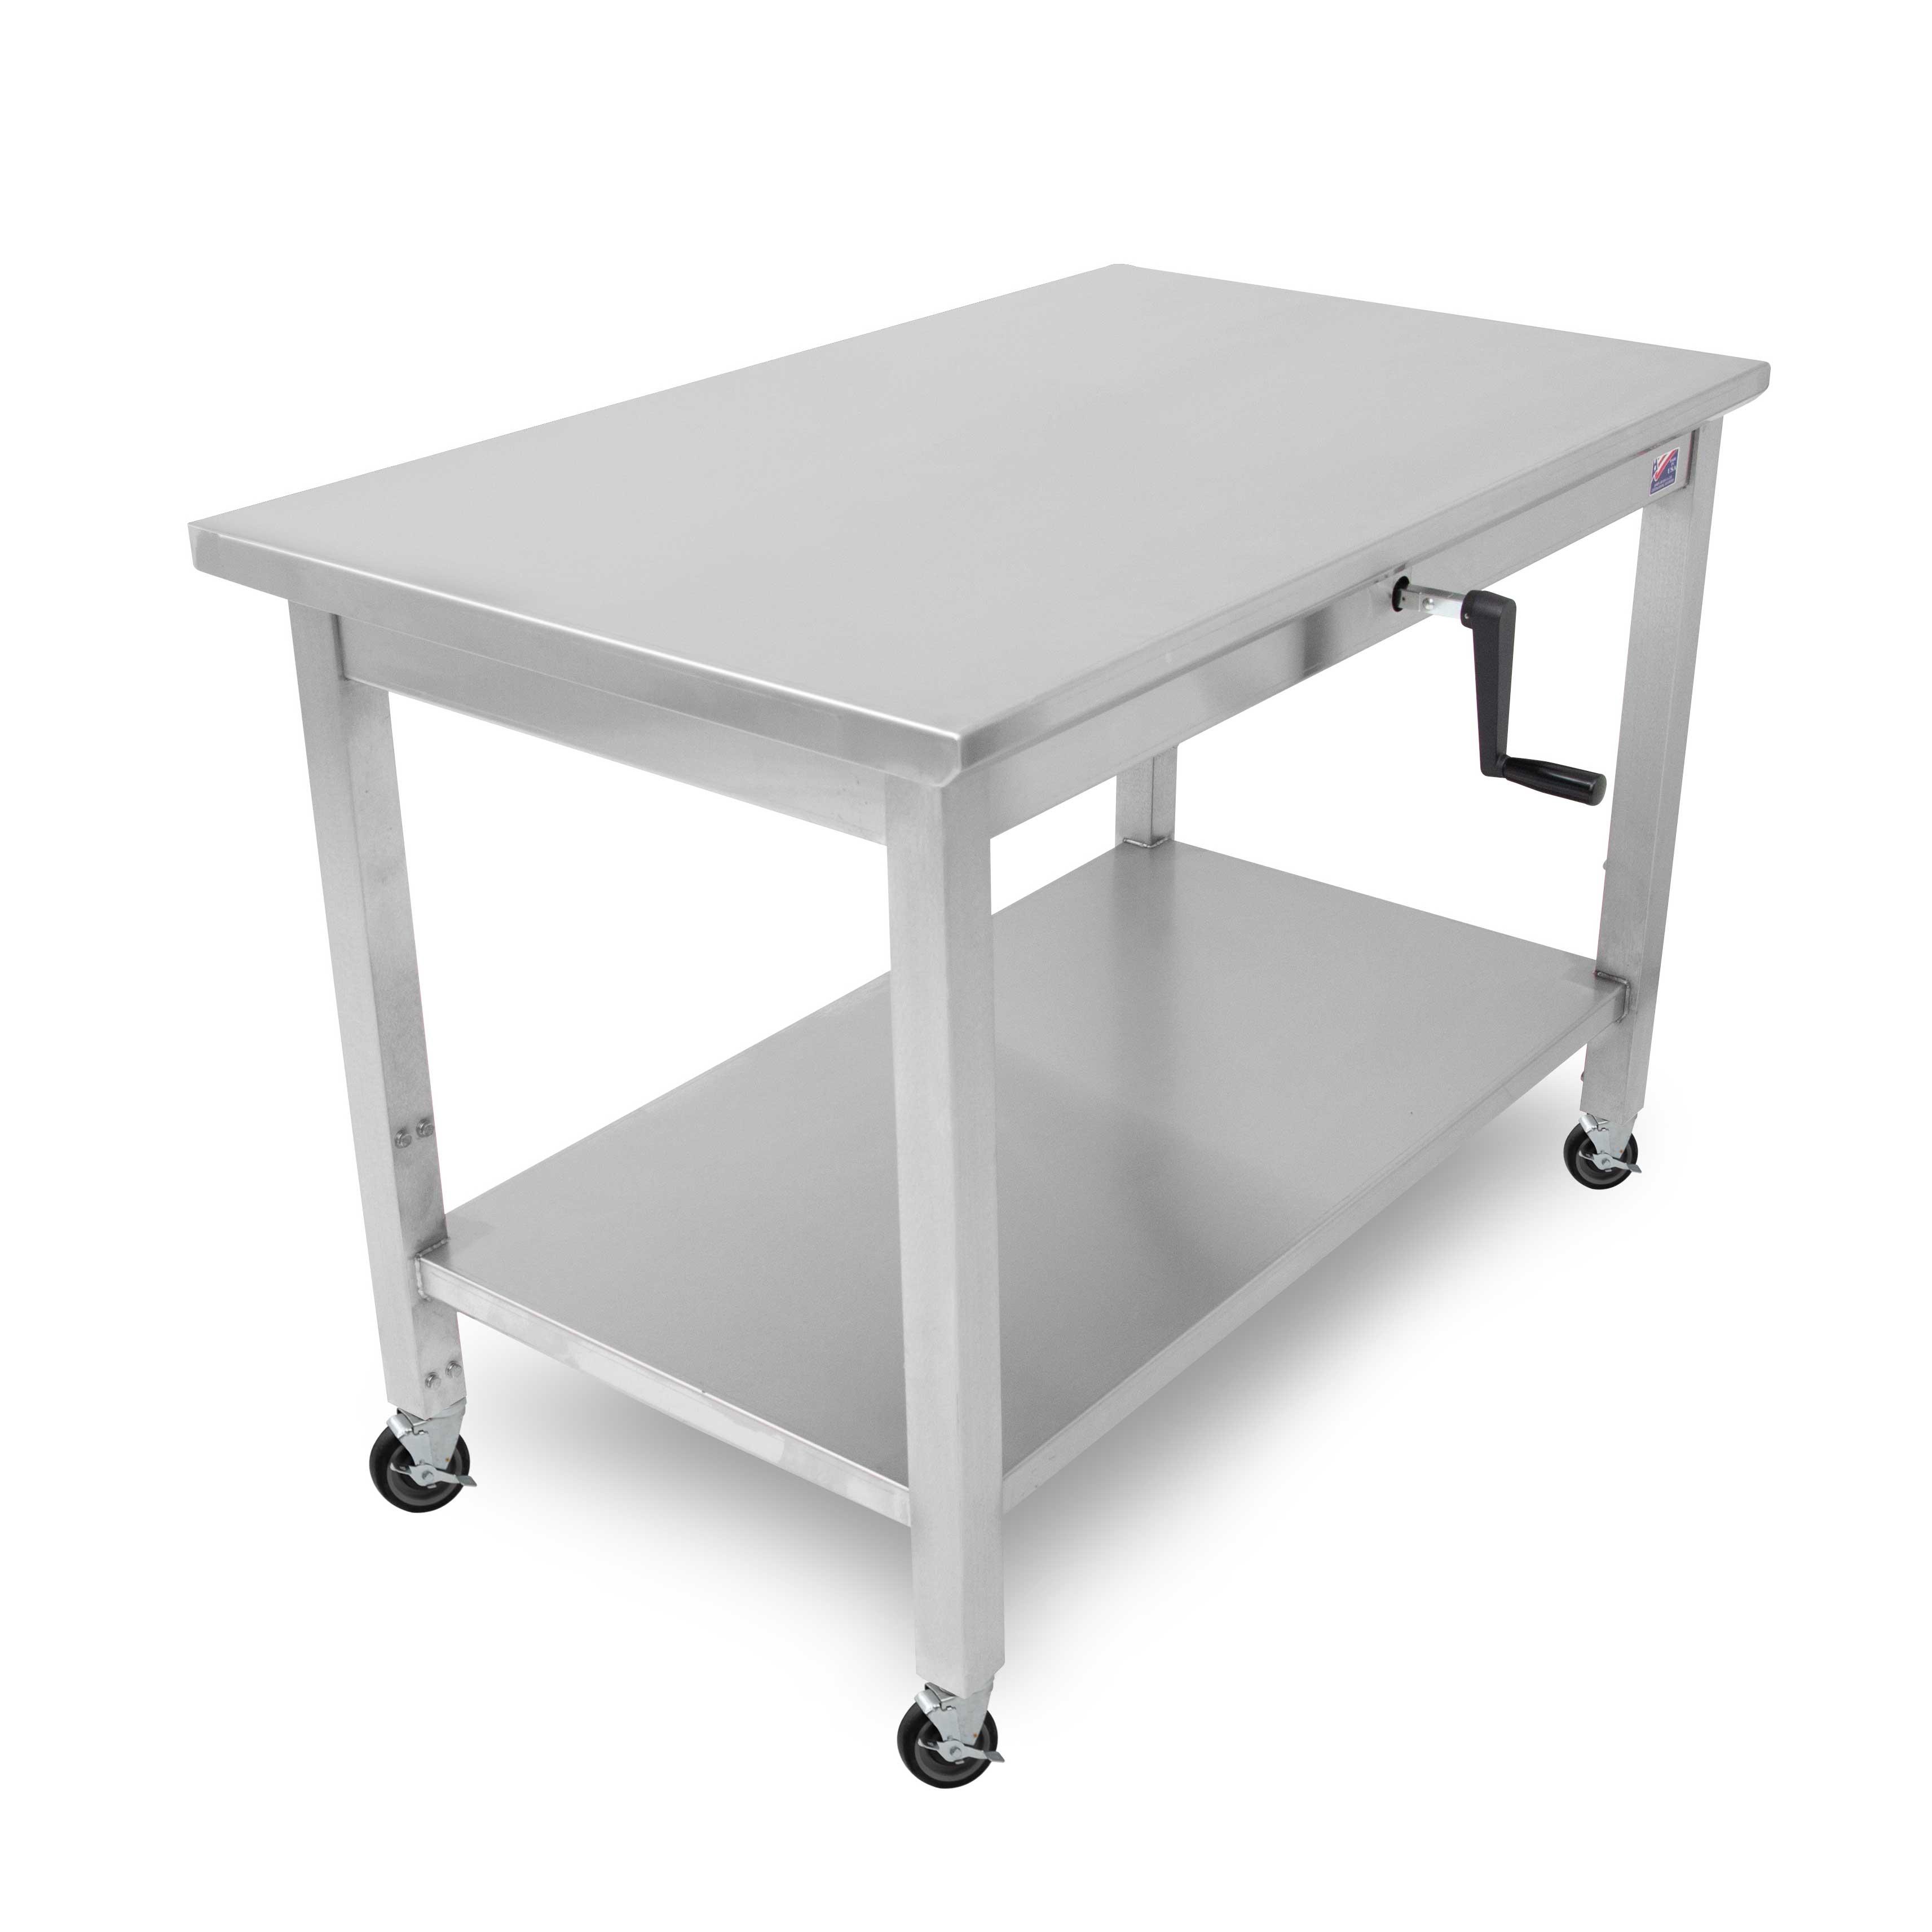 John Boos LT6-3048SSW-C work table,  40